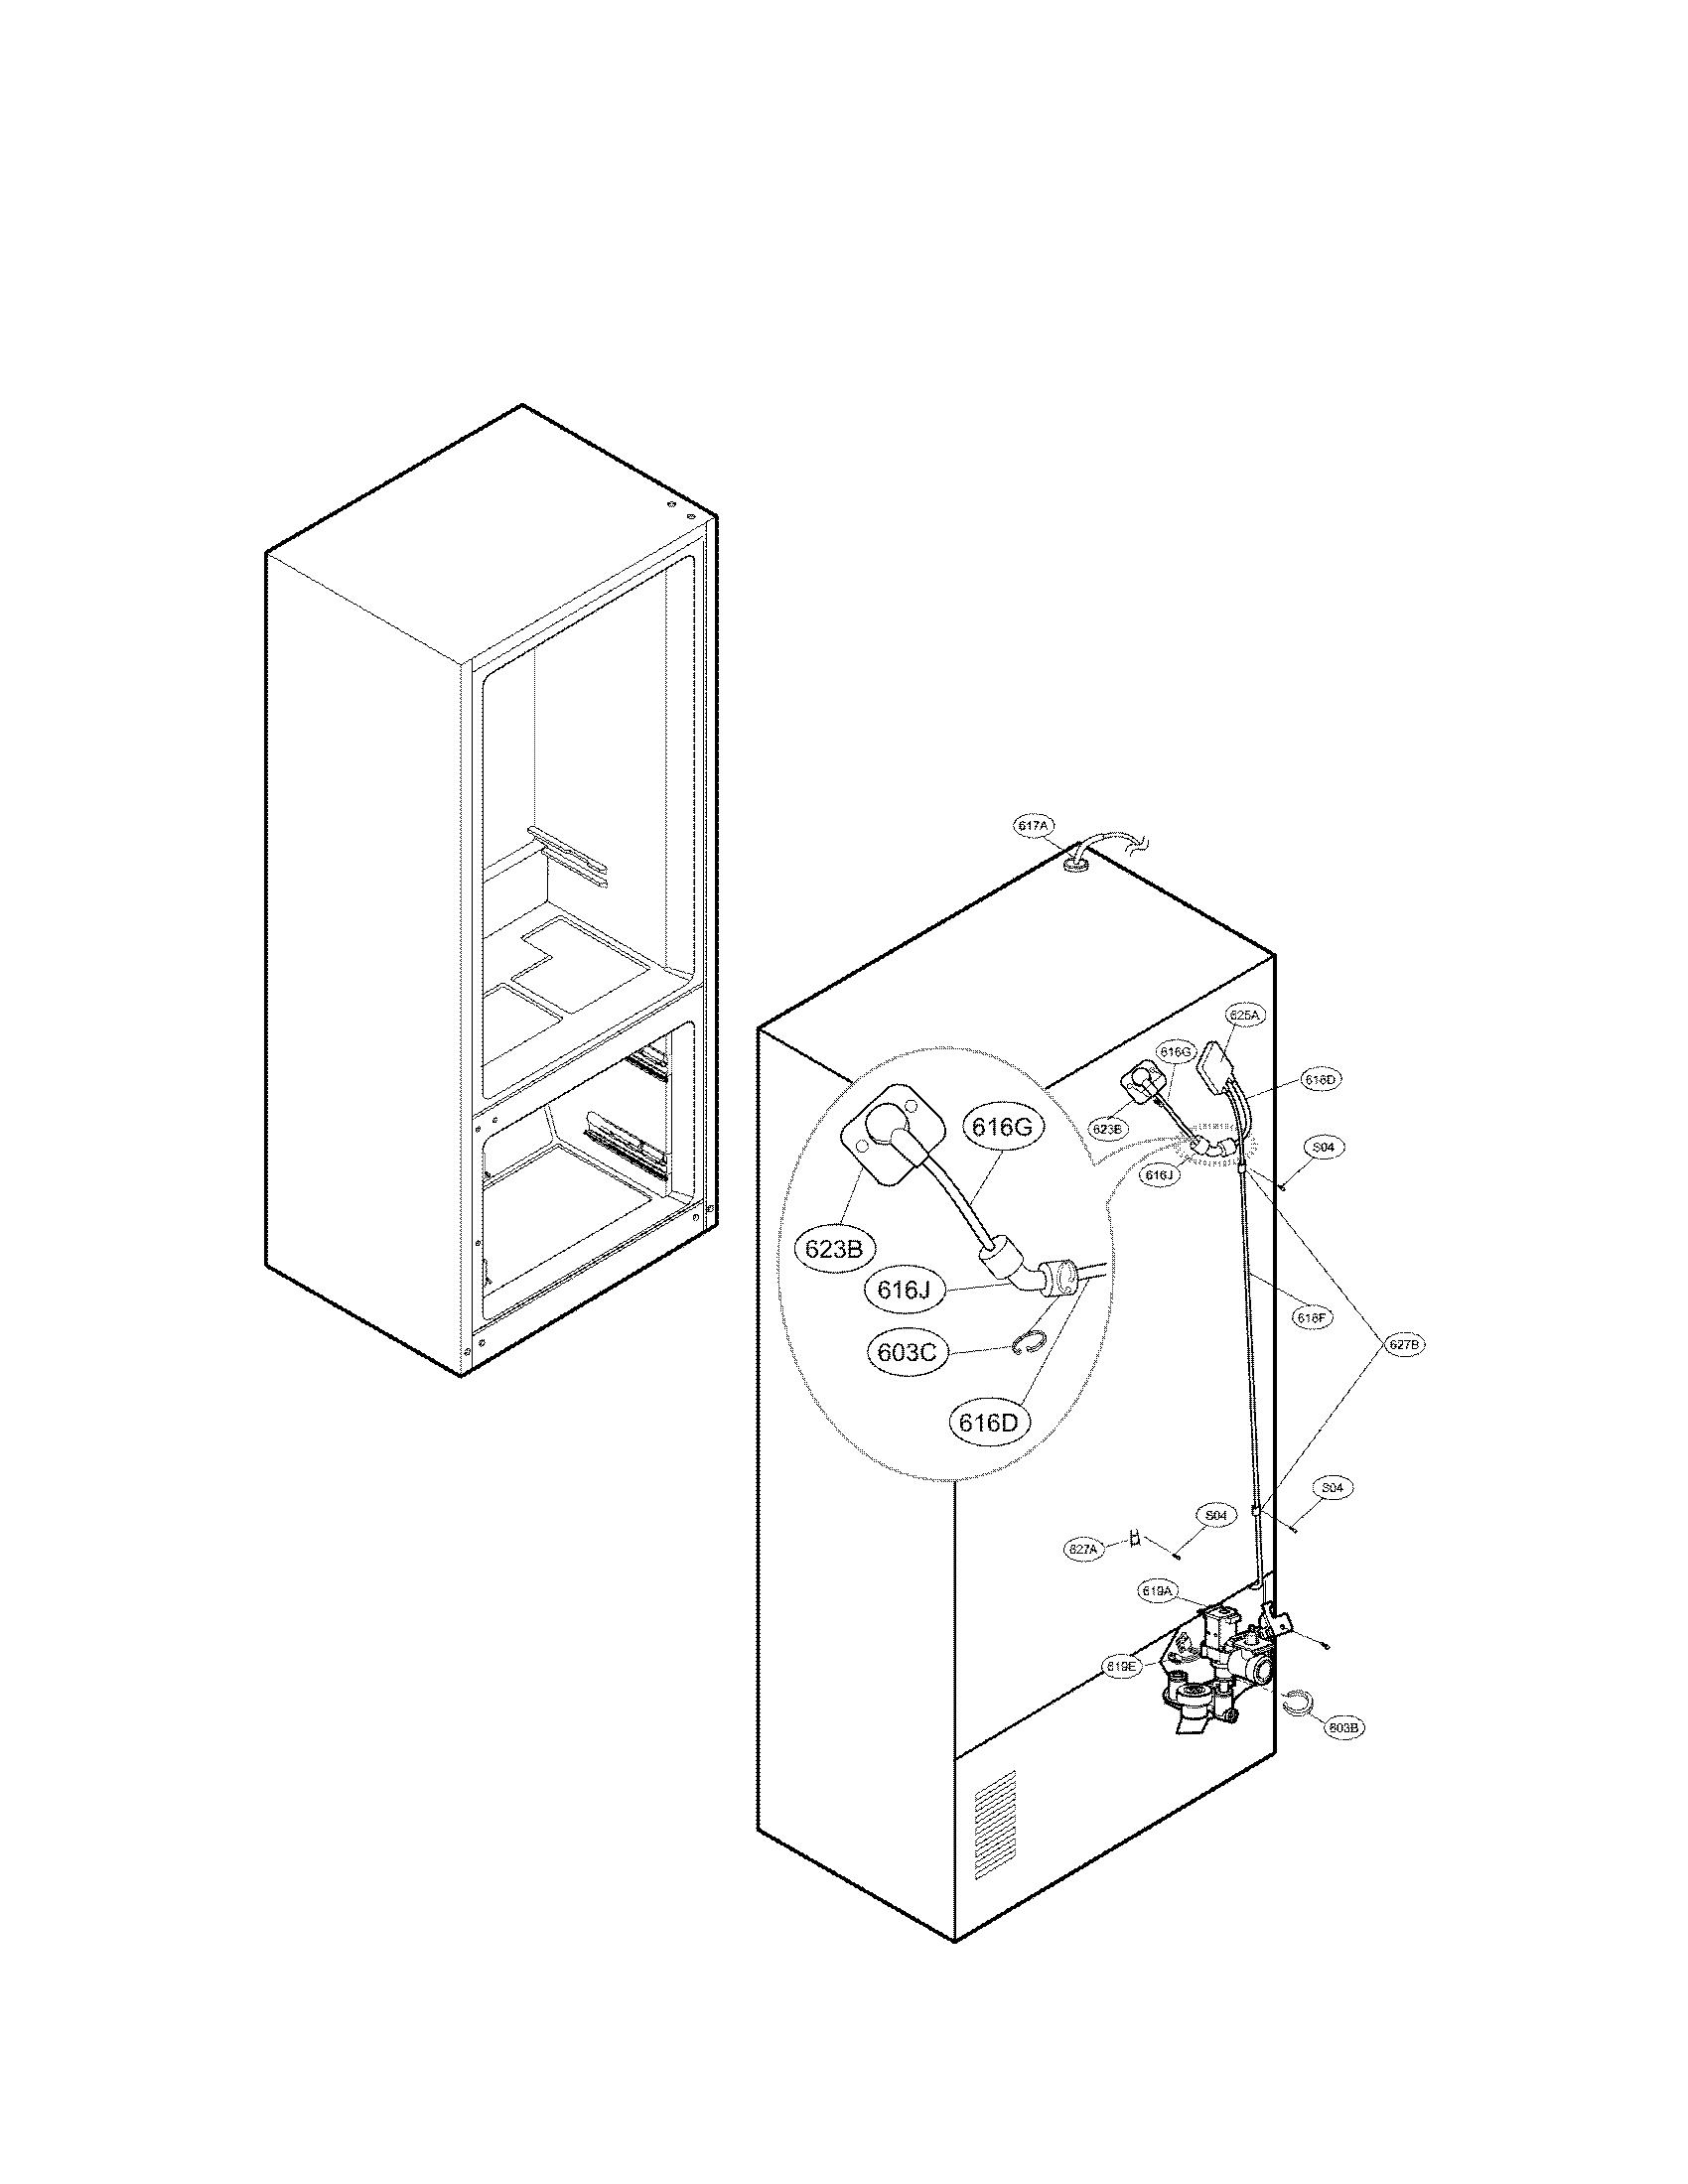 Lg model LFX31945ST bottom-mount refrigerator genuine parts